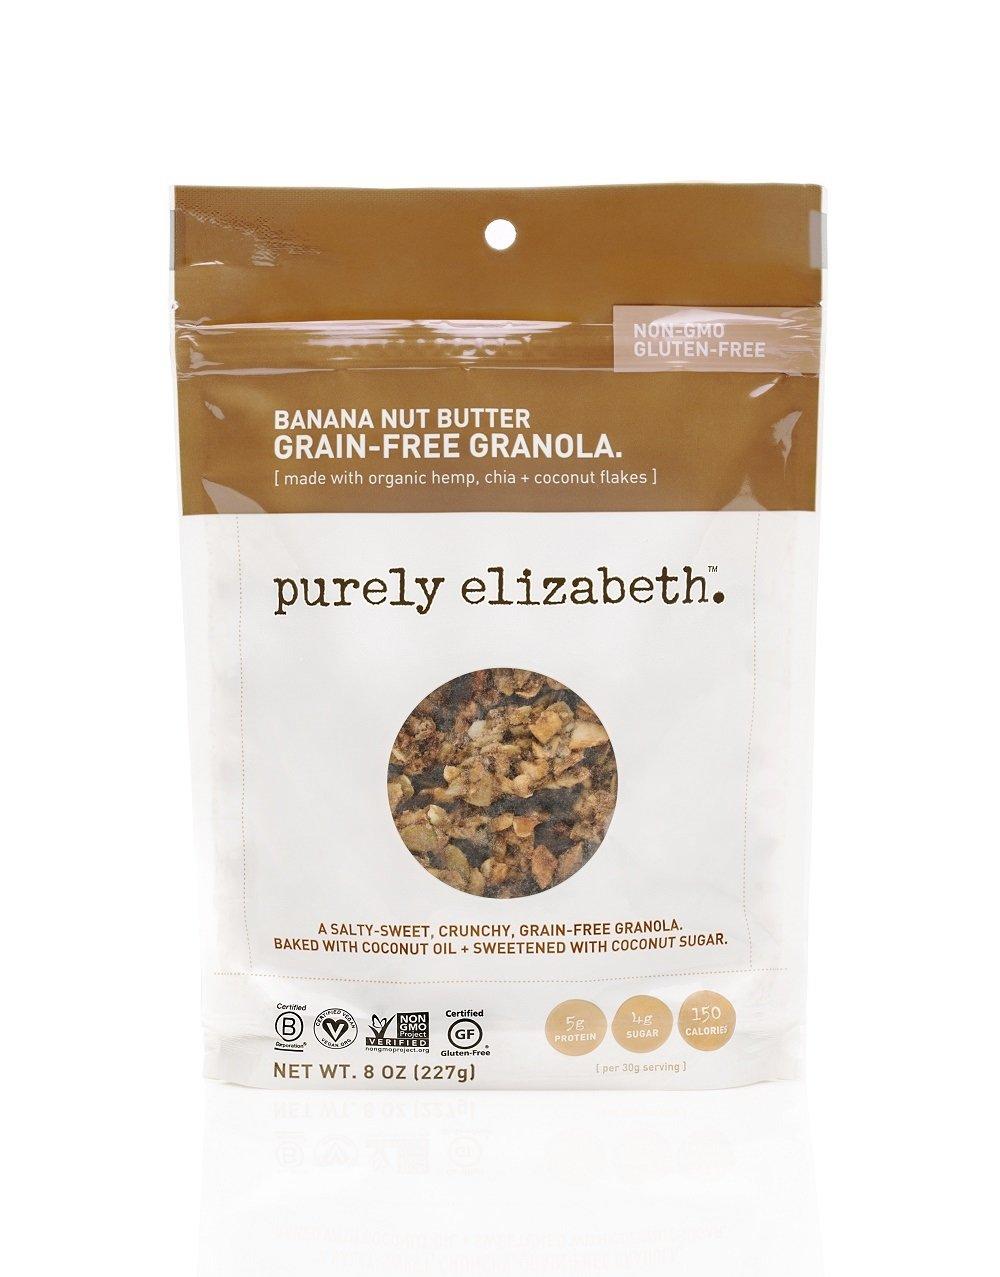 purely elizabeth Grain Free & Gluten Free Granola, Banana Nut Butter, 3 Count